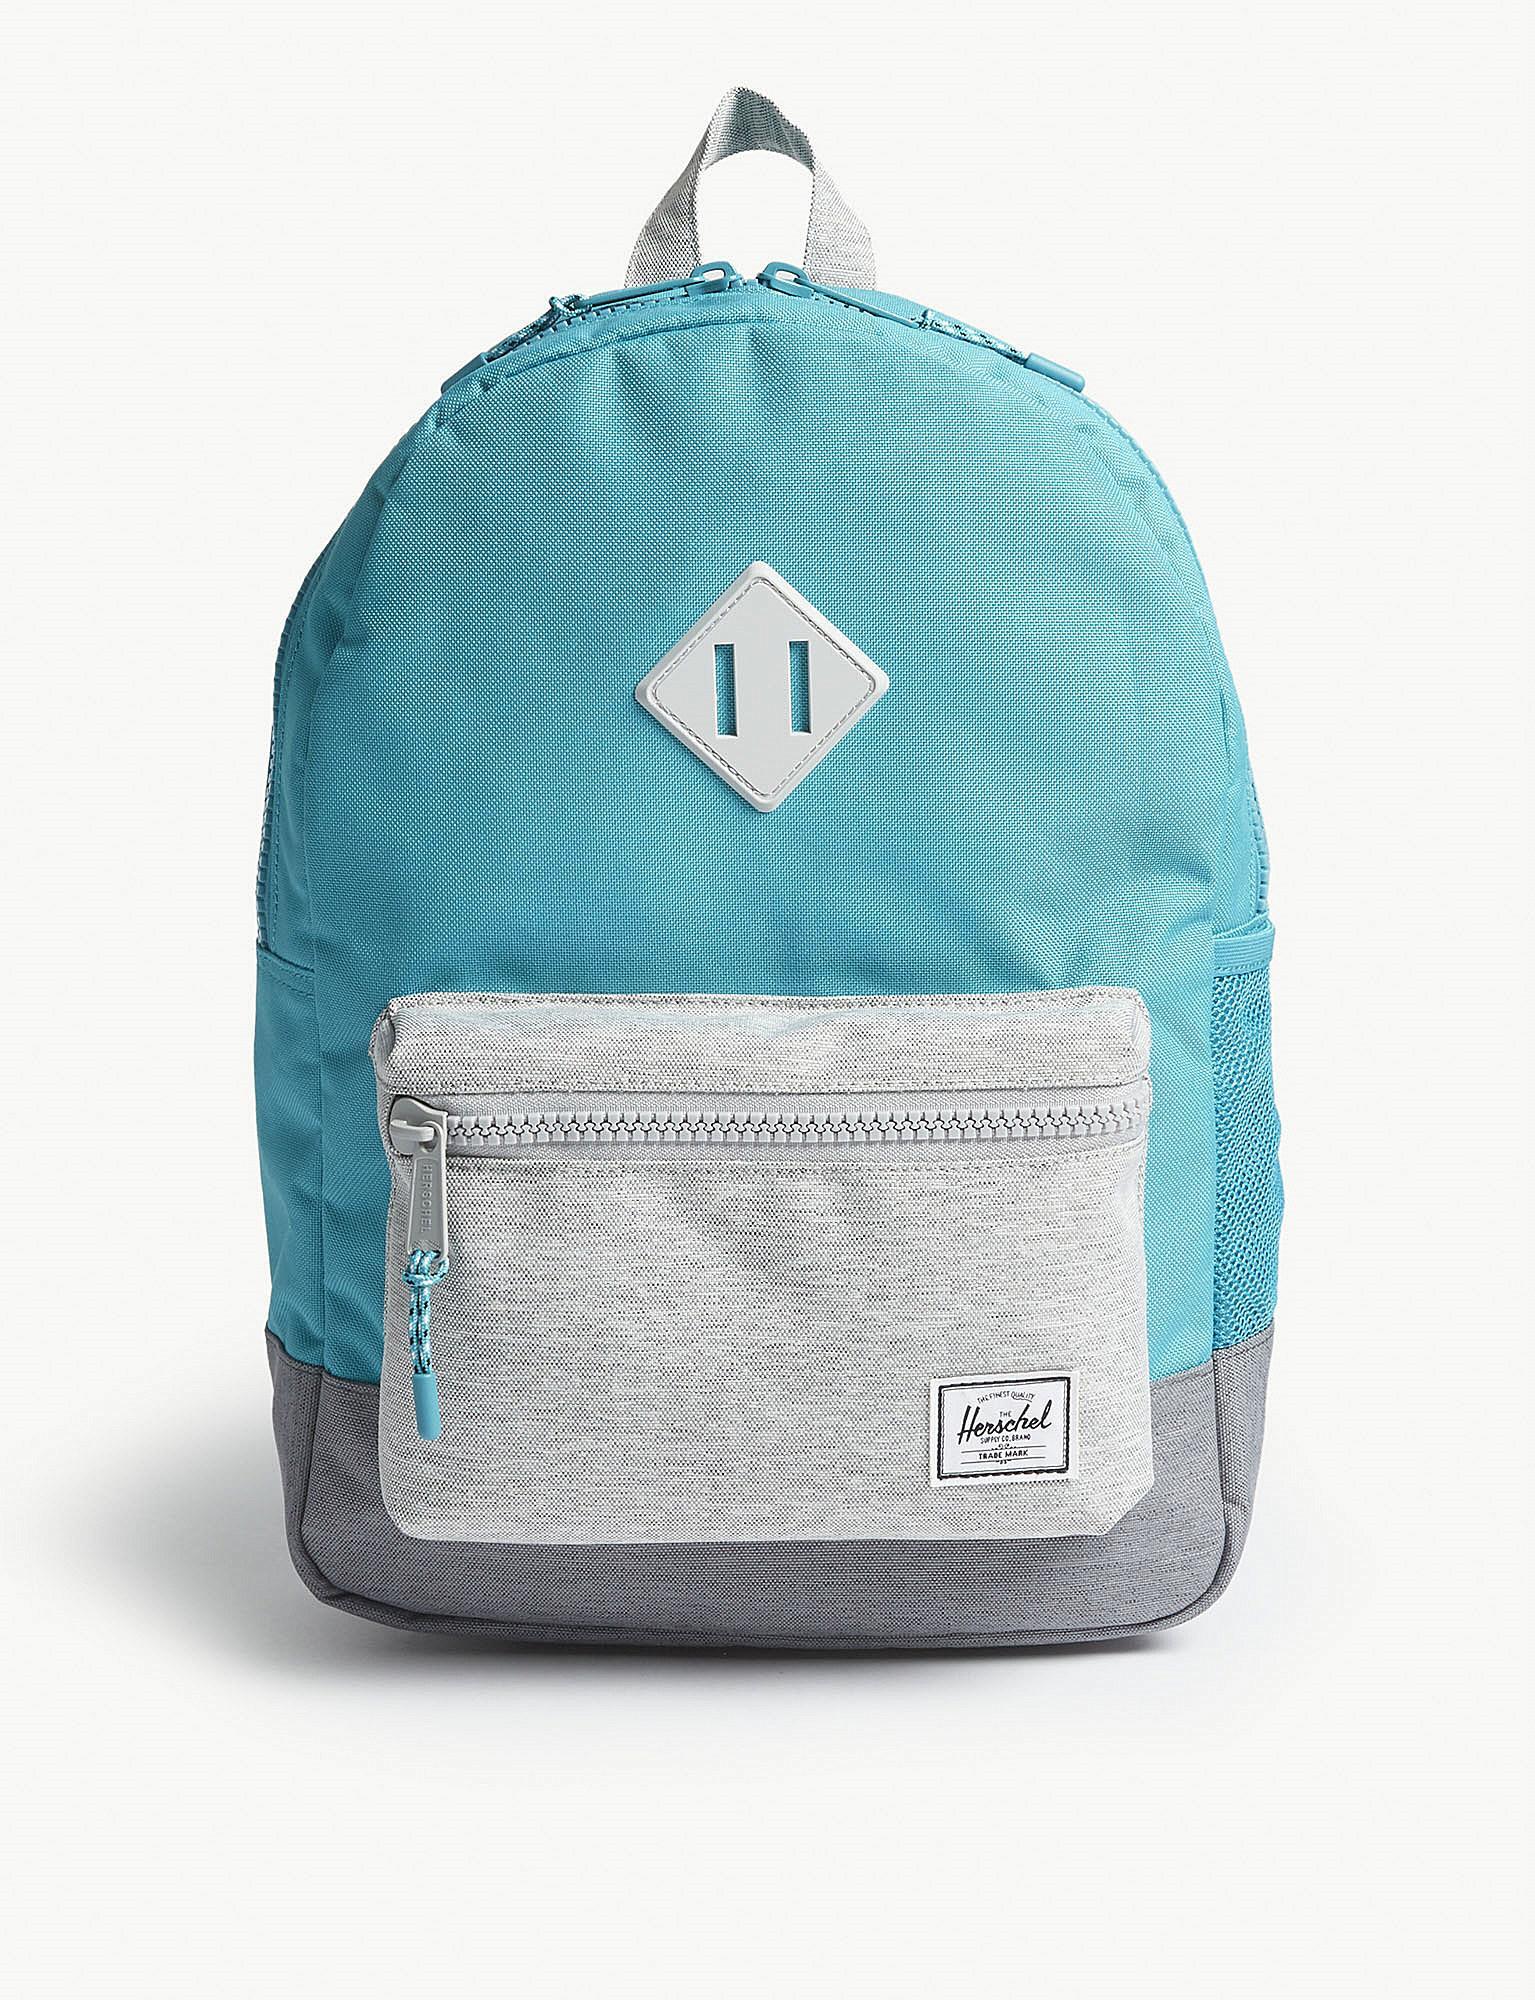 Herschel Supply Co. Heritage Colourblock Backpack 9l in Blue - Lyst 6396455f51245